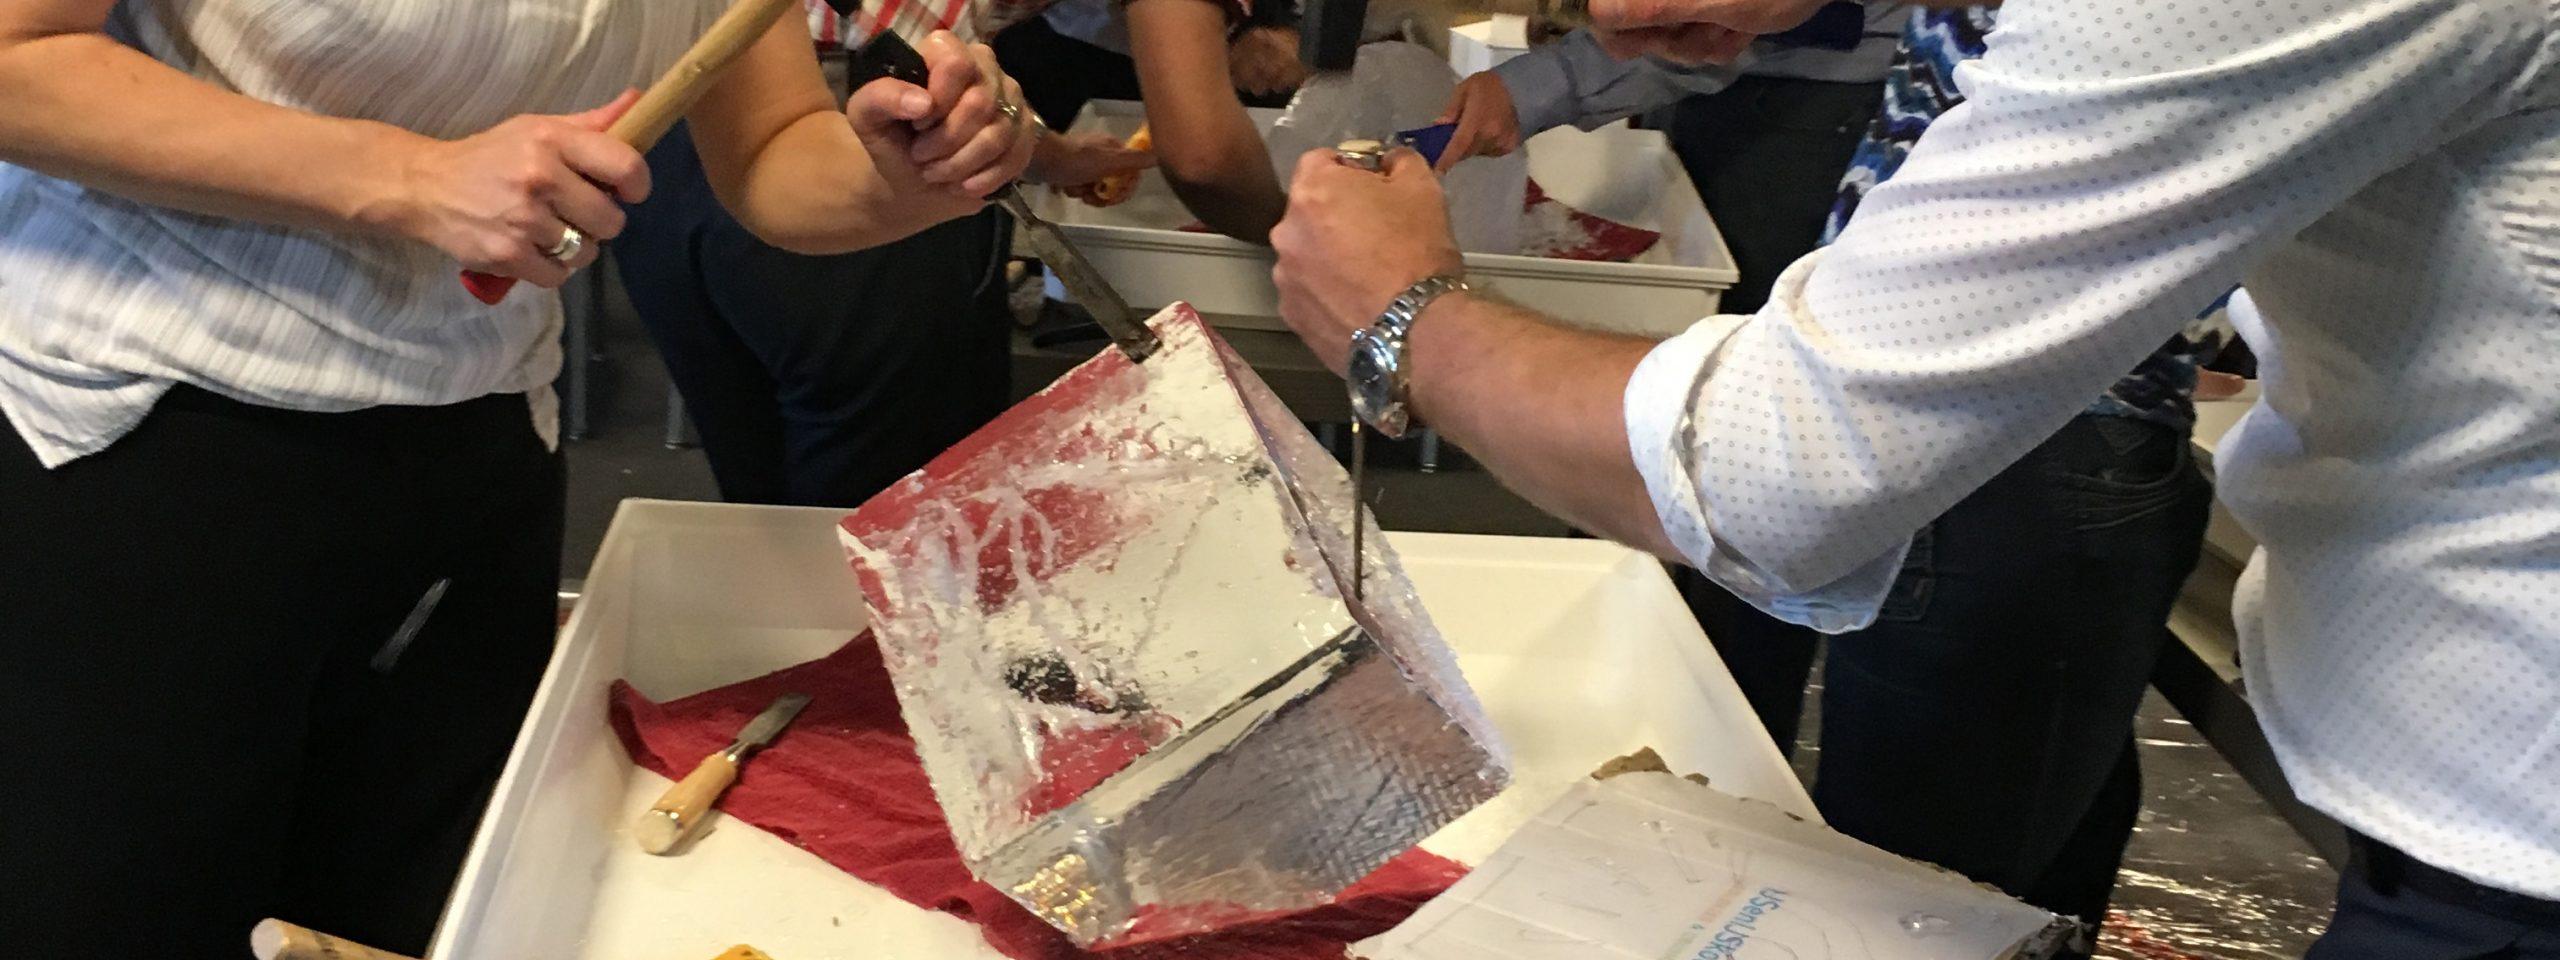 teamuitje-den-bosch-winteruitjes-ice-sculpting